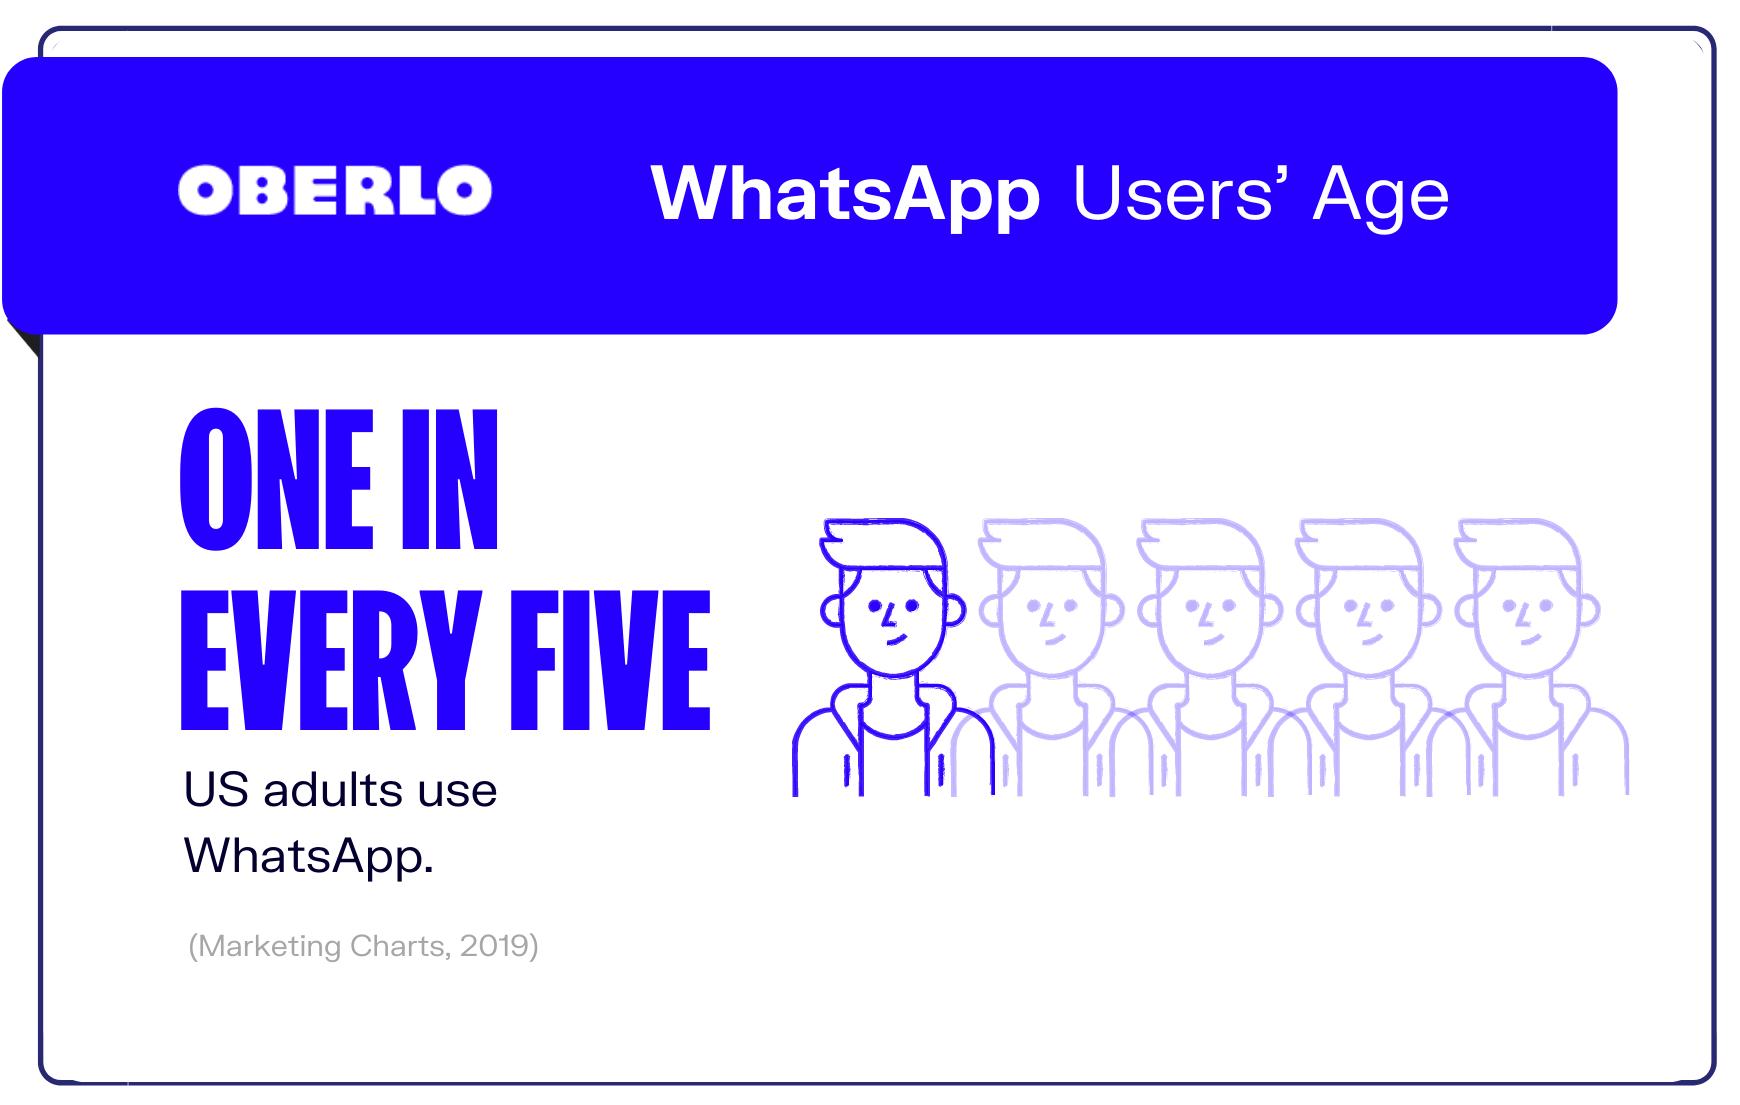 graphic of whatsapp statistic #8